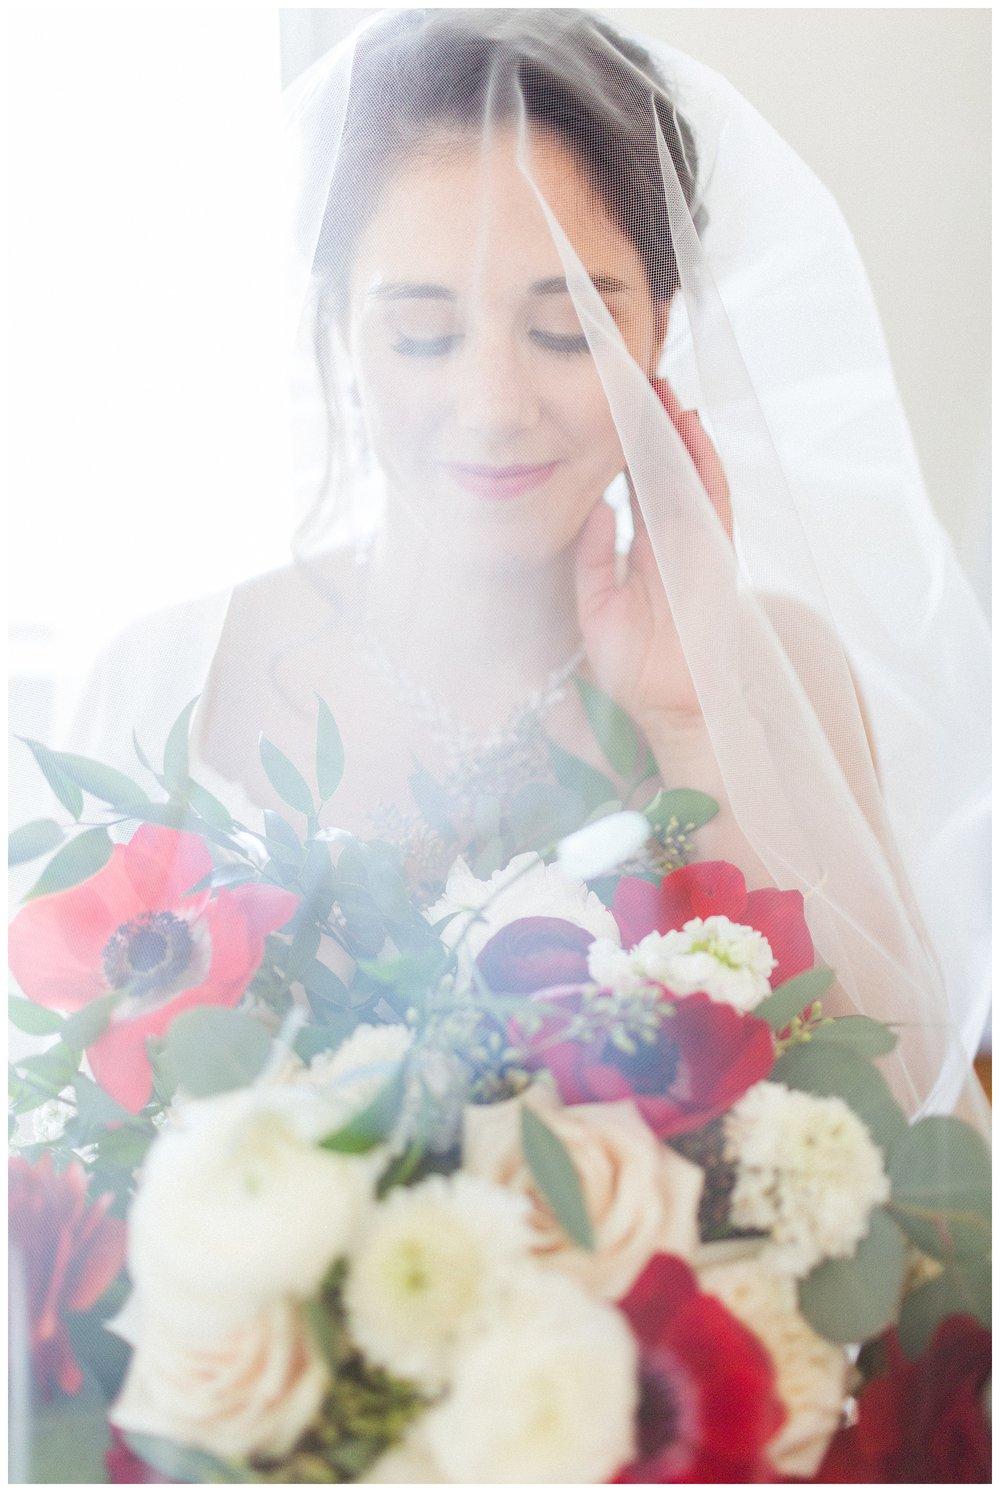 Stone Tower Winery Wedding | Virginia Winter Wedding | VA Wedding Photographer Kir Tuben_0021.jpg